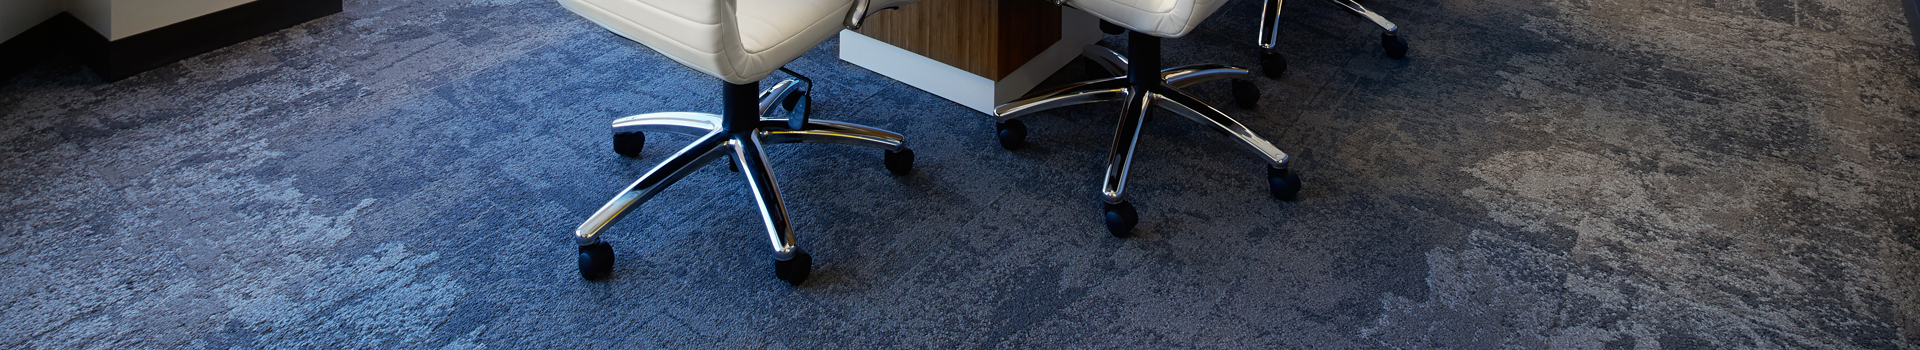 Heuga Interface tapijttegels